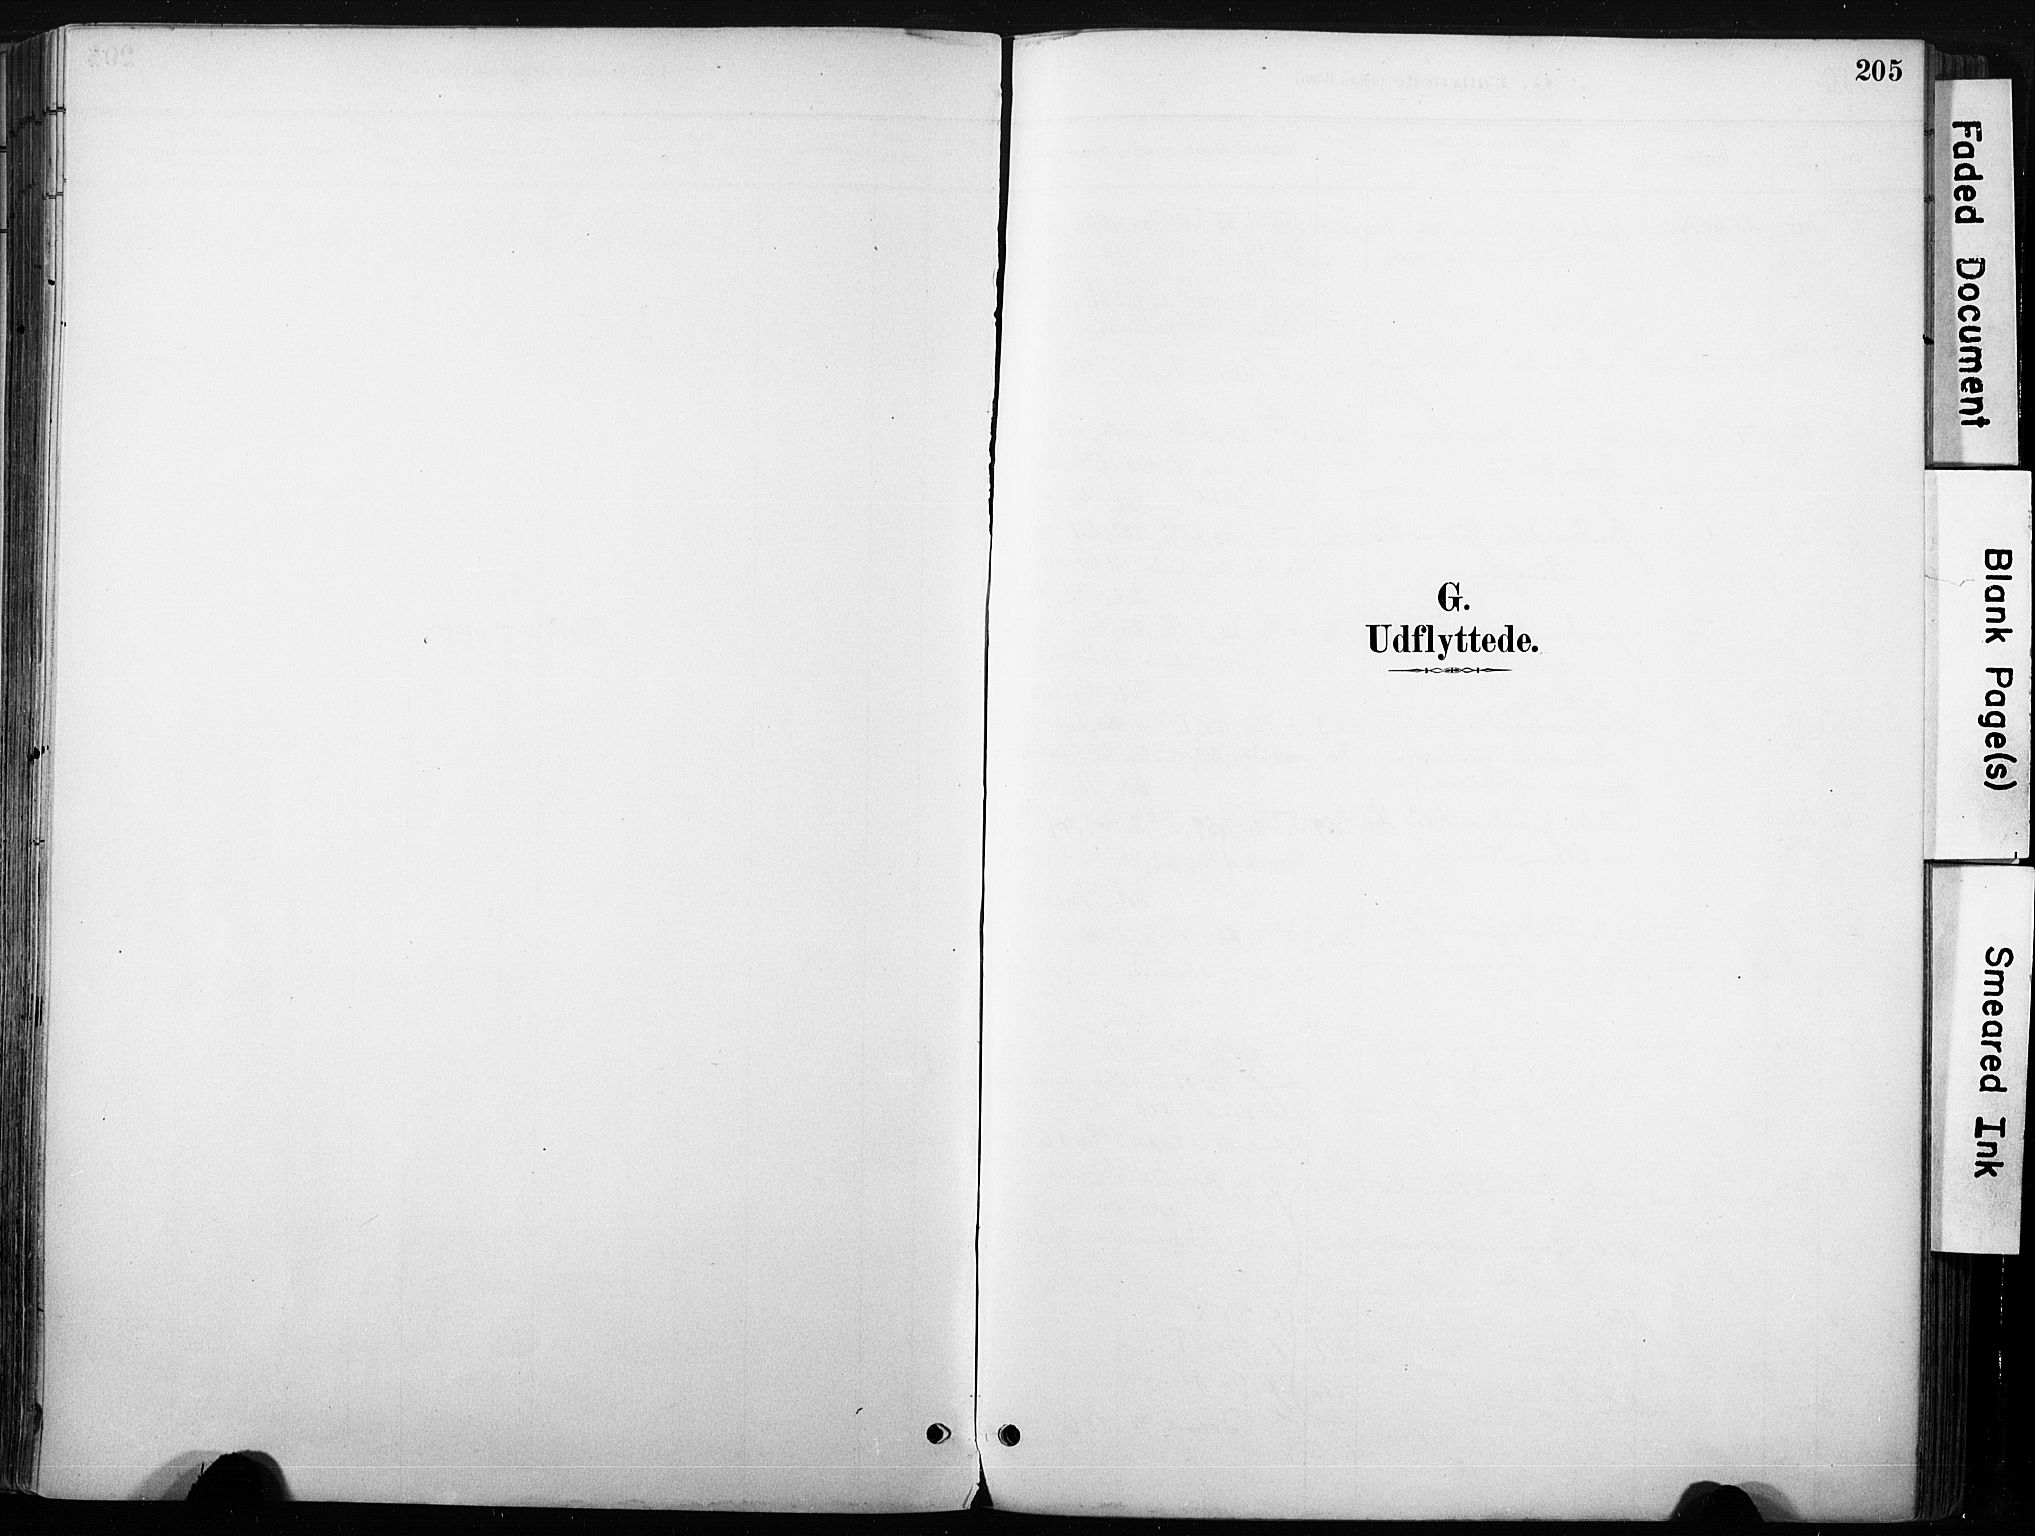 SAKO, Nore kirkebøker, F/Fb/L0002: Ministerialbok nr. II 2, 1886-1906, s. 205